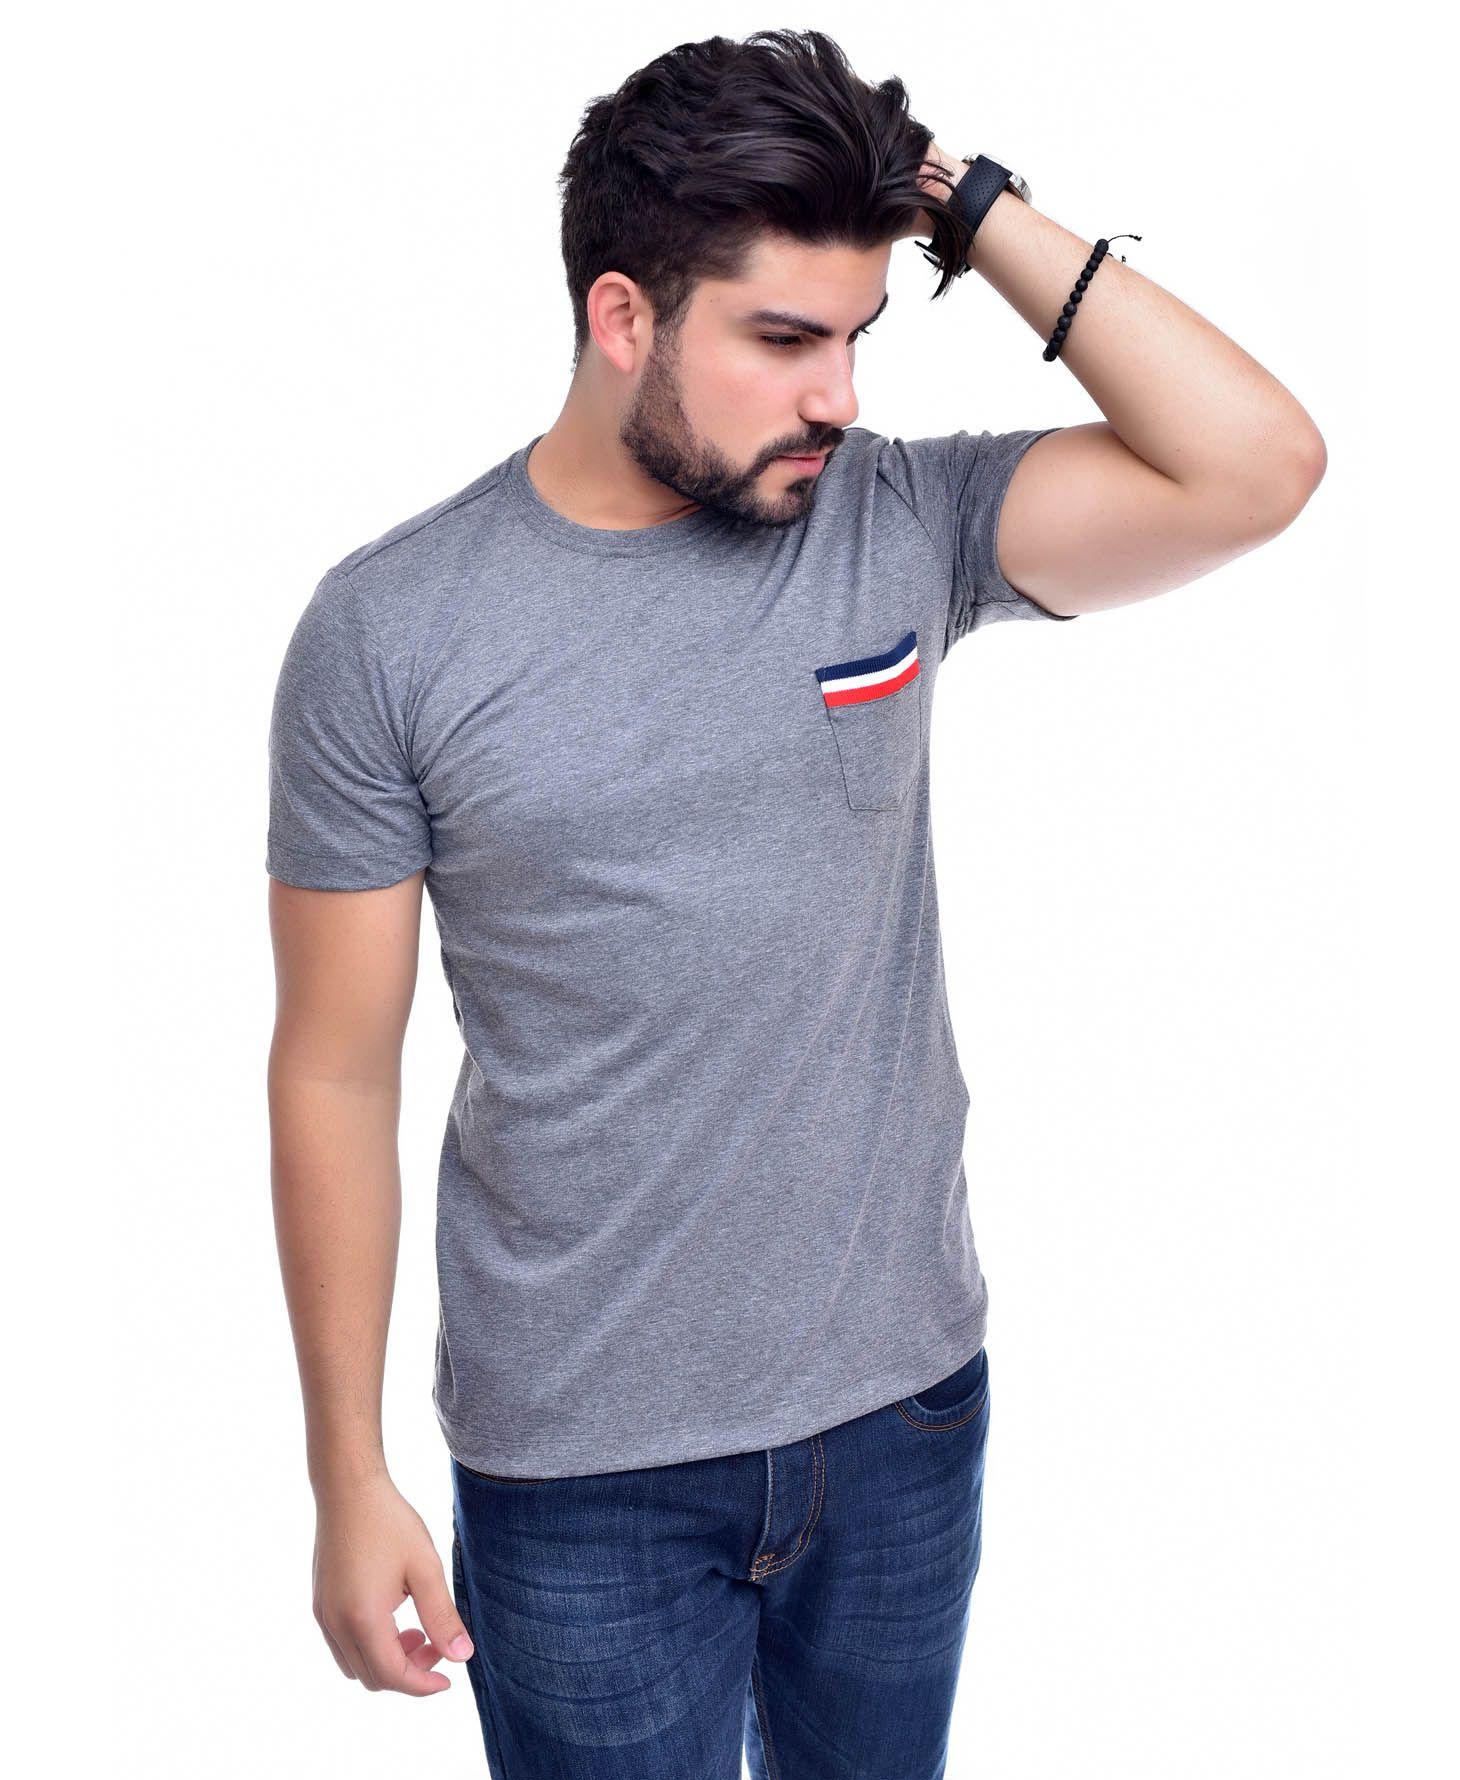 Camiseta Bolso TH Mescla Escuro / ME